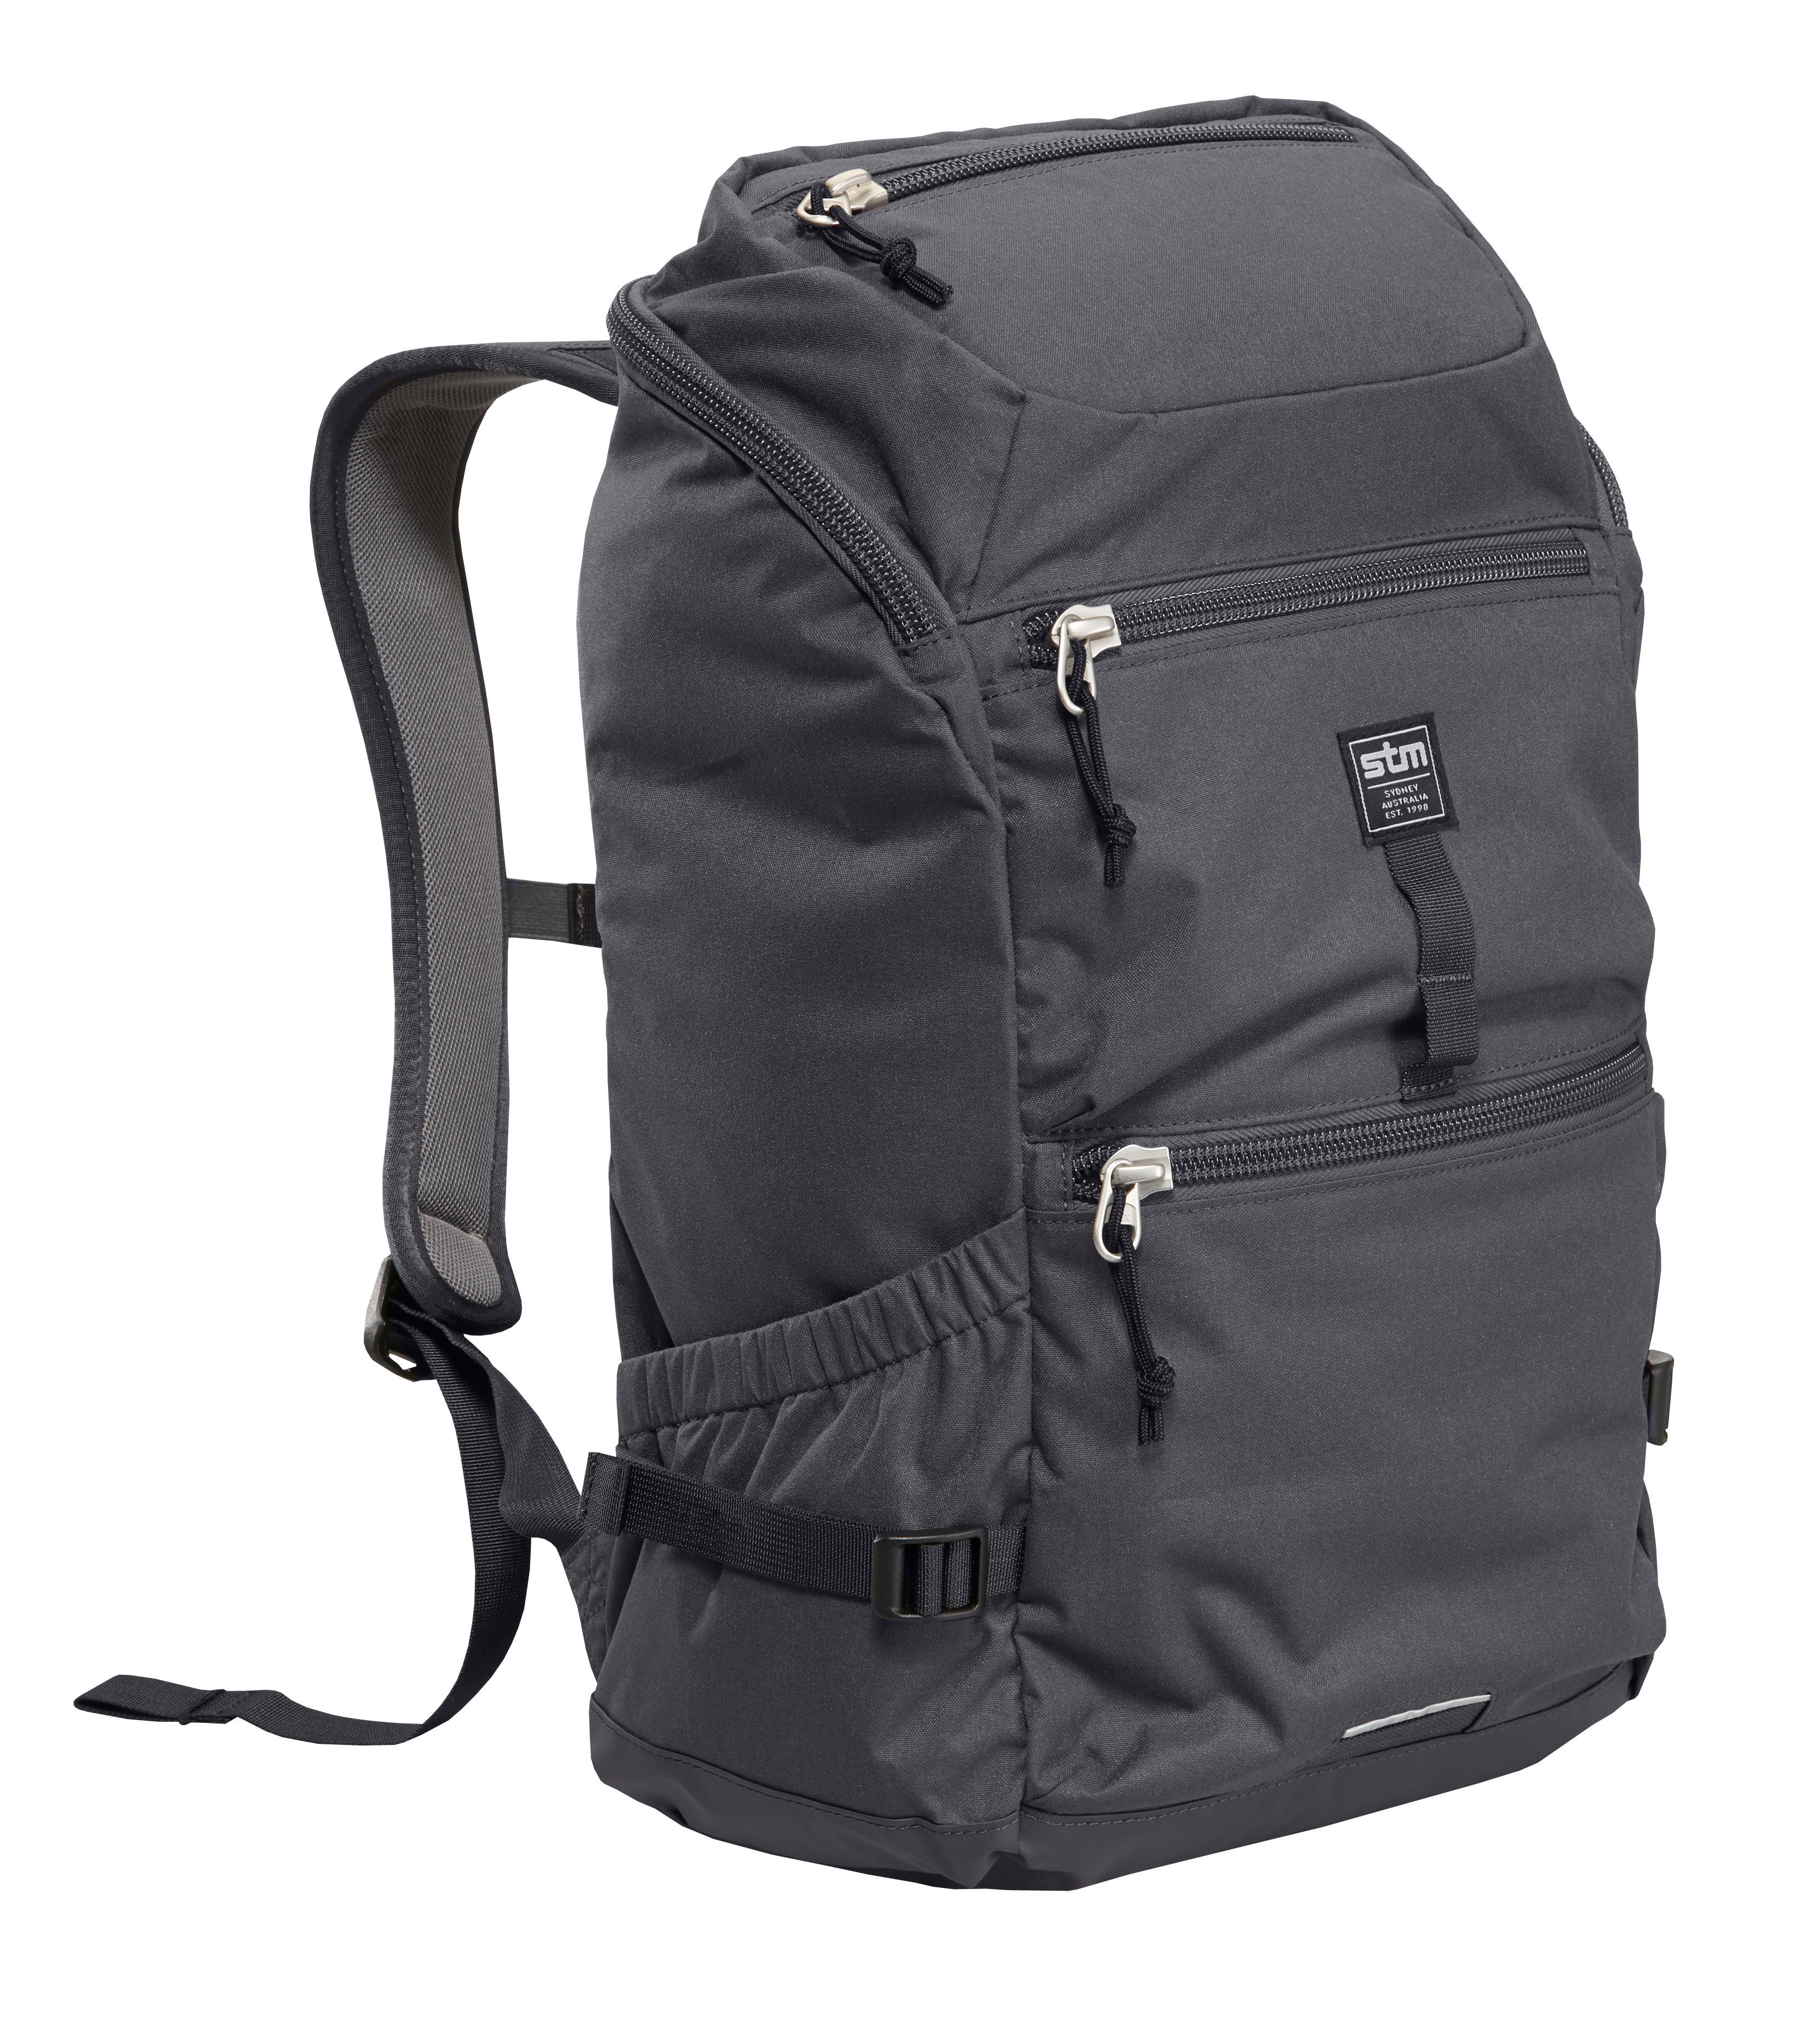 stm drifter laptop backpack for 15 inch laptop